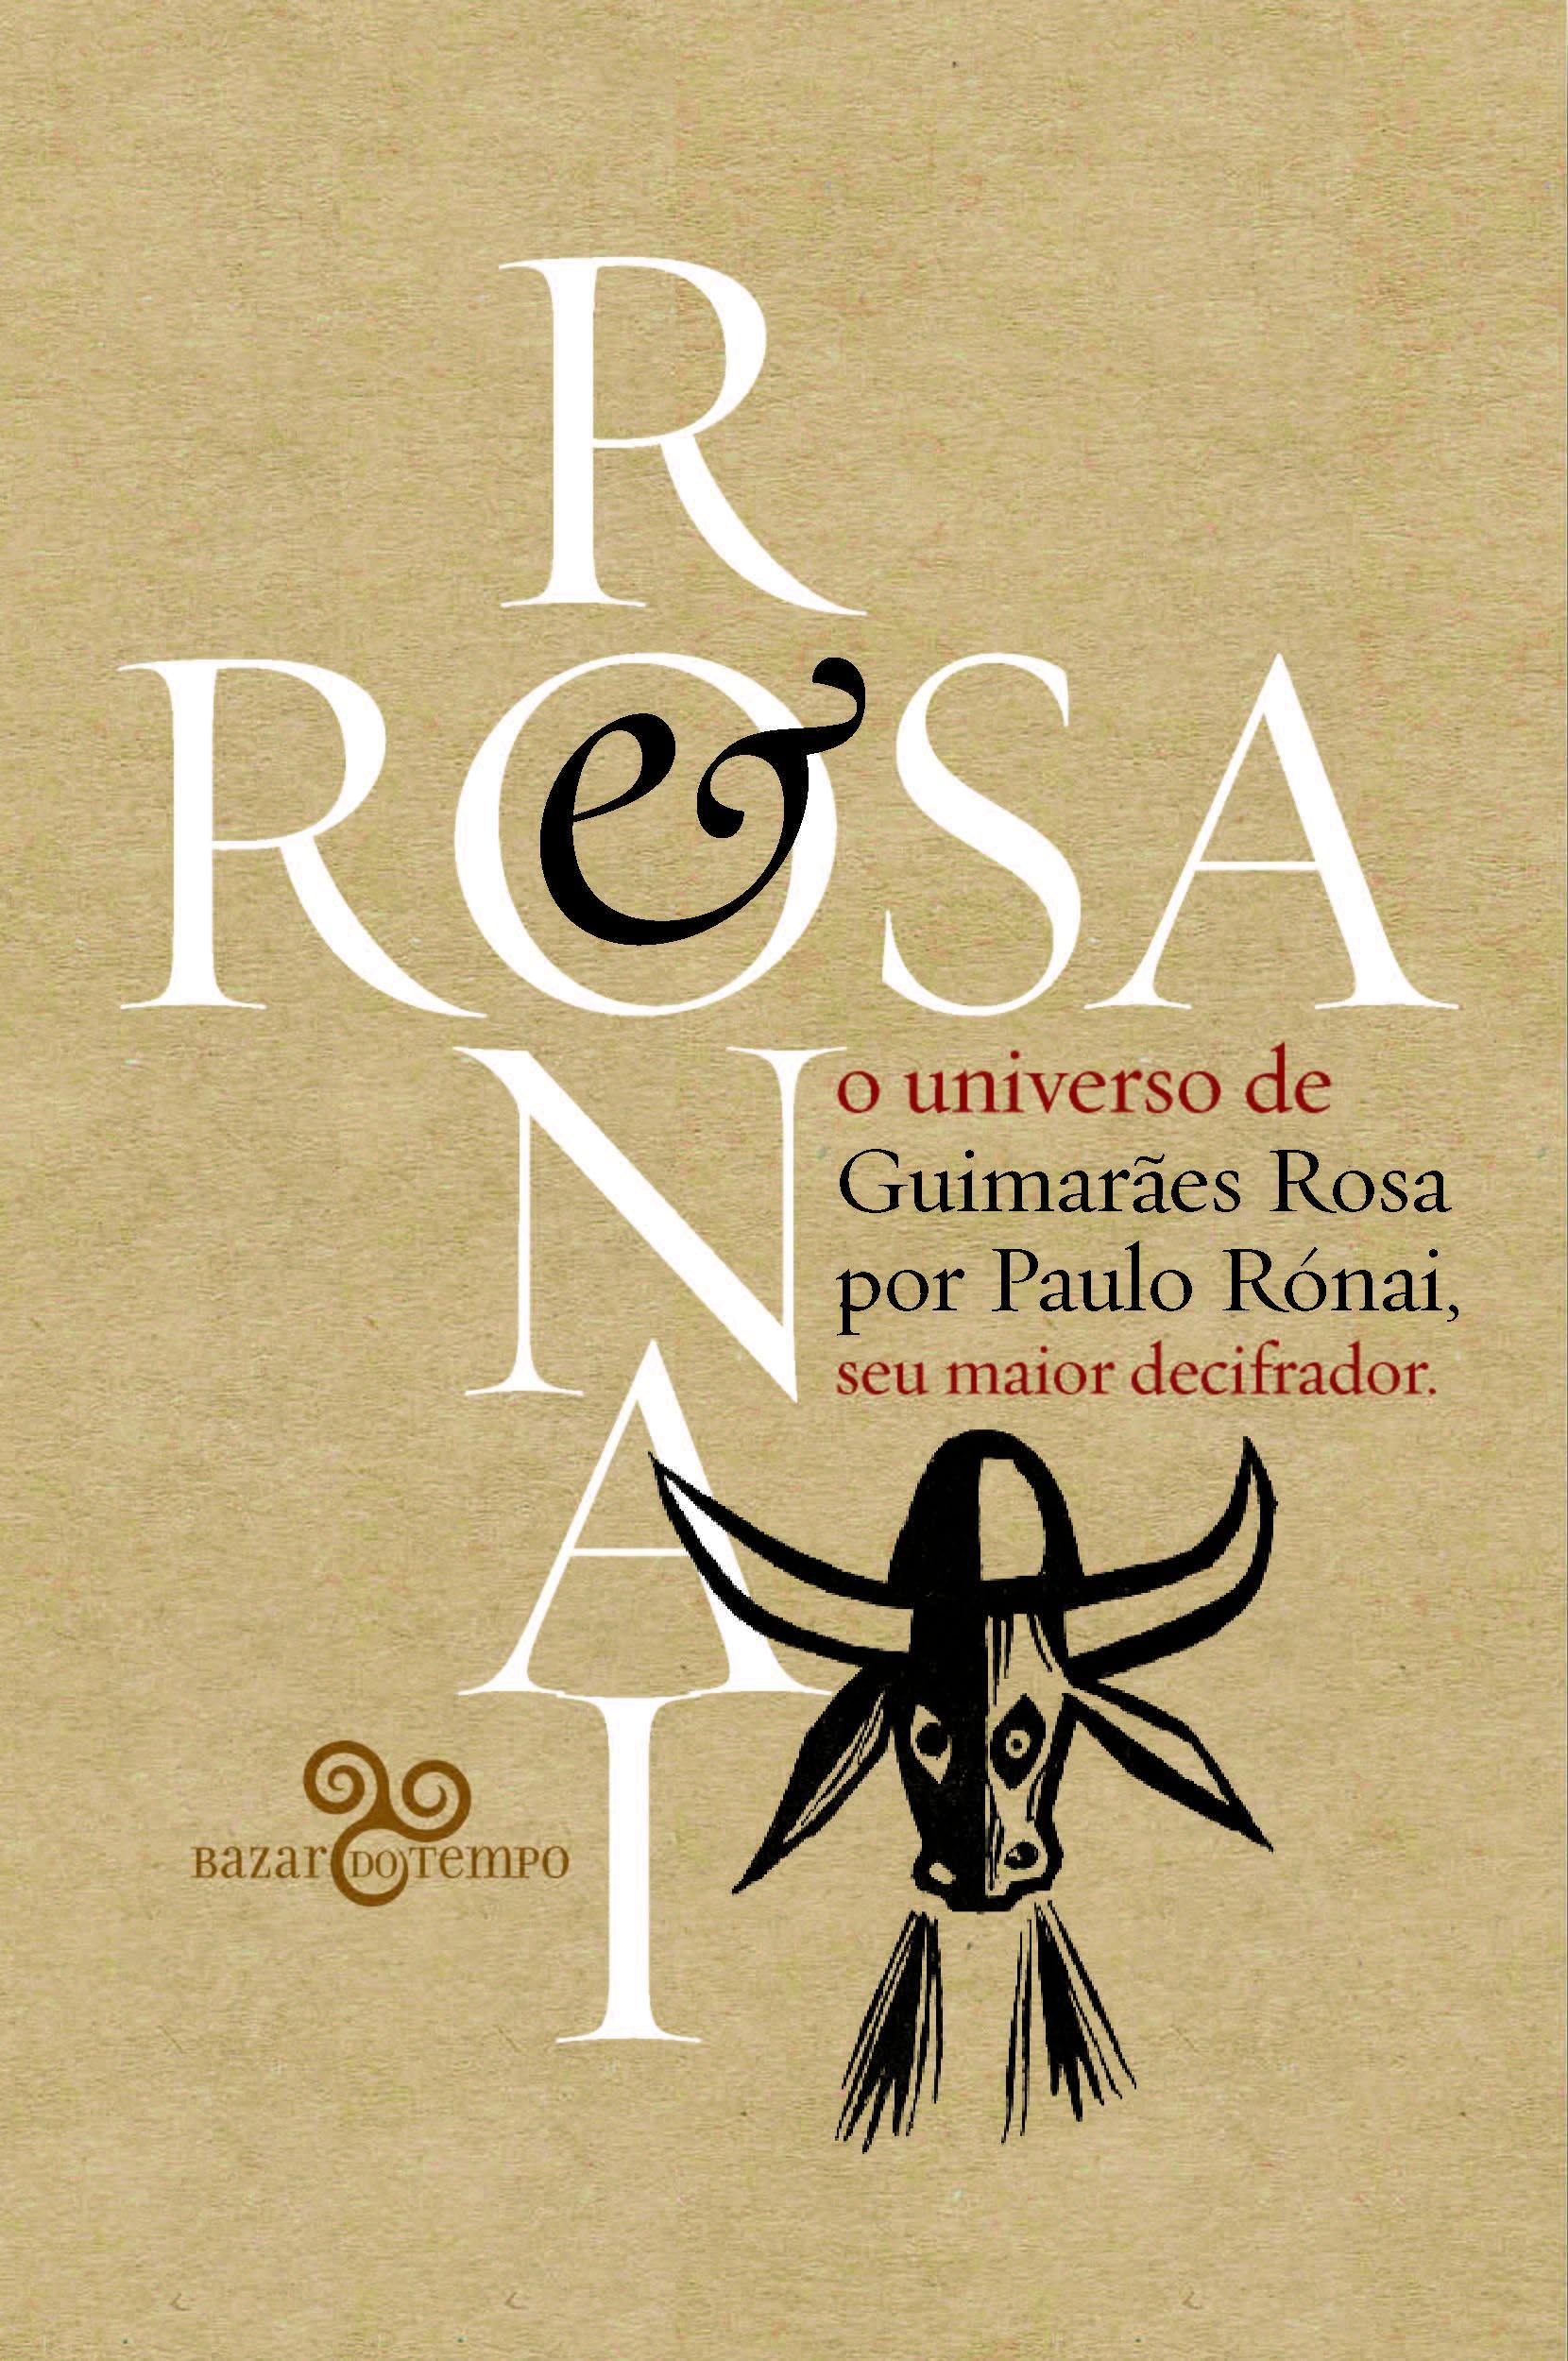 Rosa & Rónai – O universo de Guimarães Rosa por Paulo Rónai, seu maior decifrador